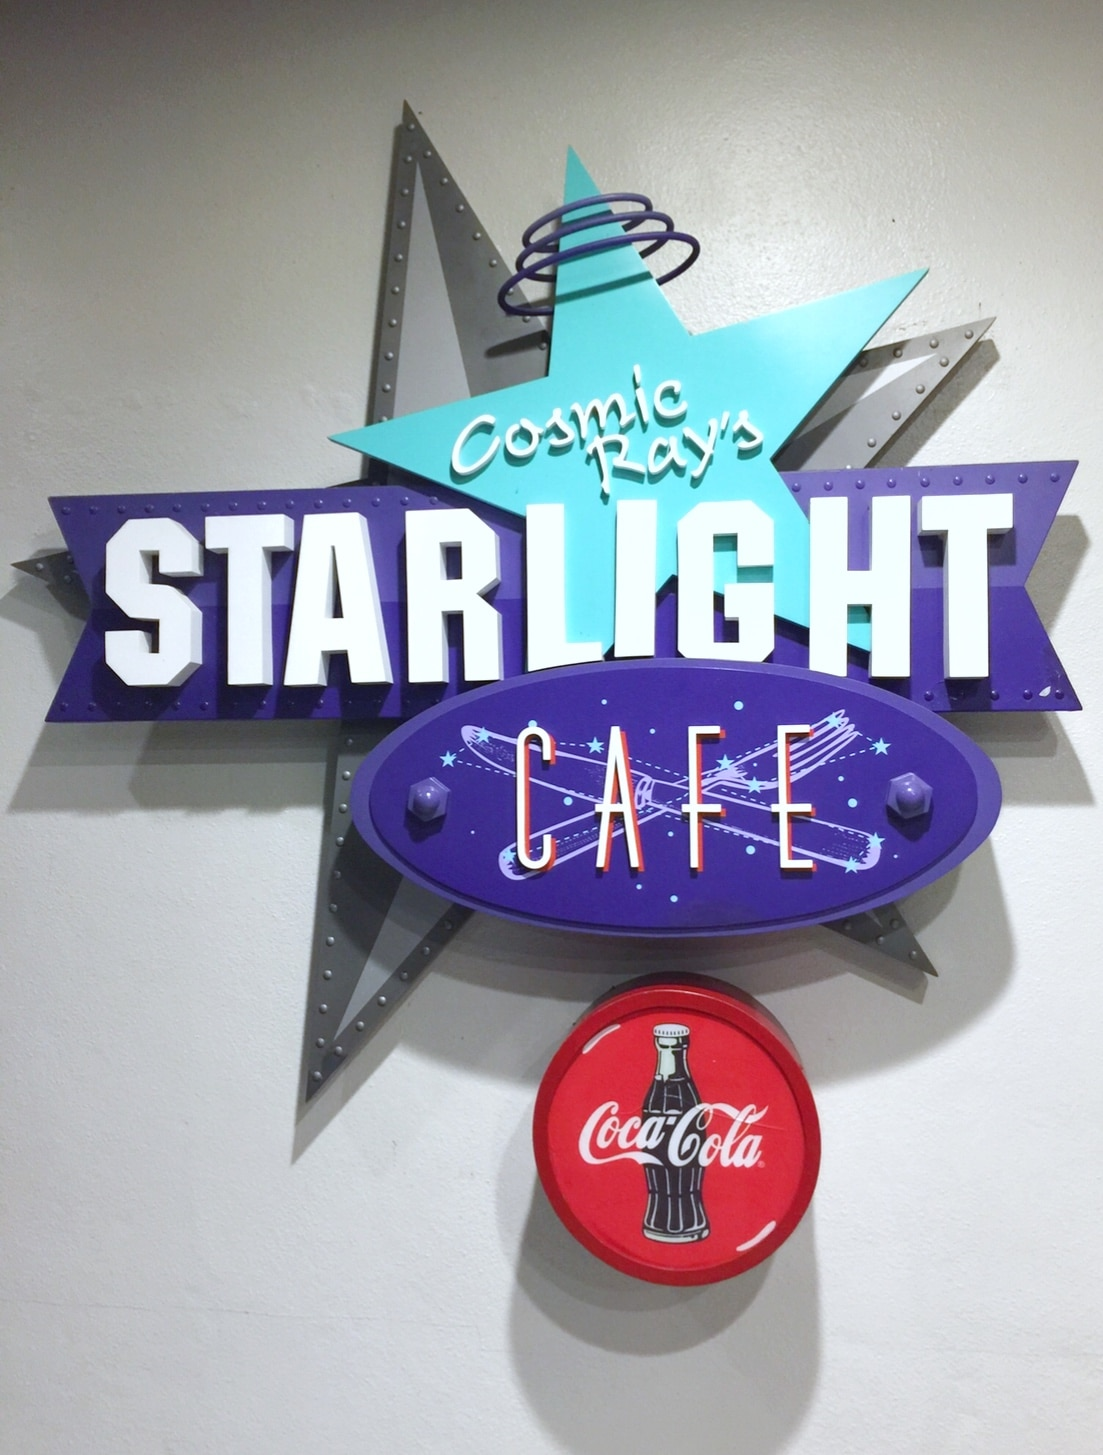 Vegan Sloppy Joe at Cosmic Ray's Starlight Cafe in the Magic Kingdom at Walt Disney World